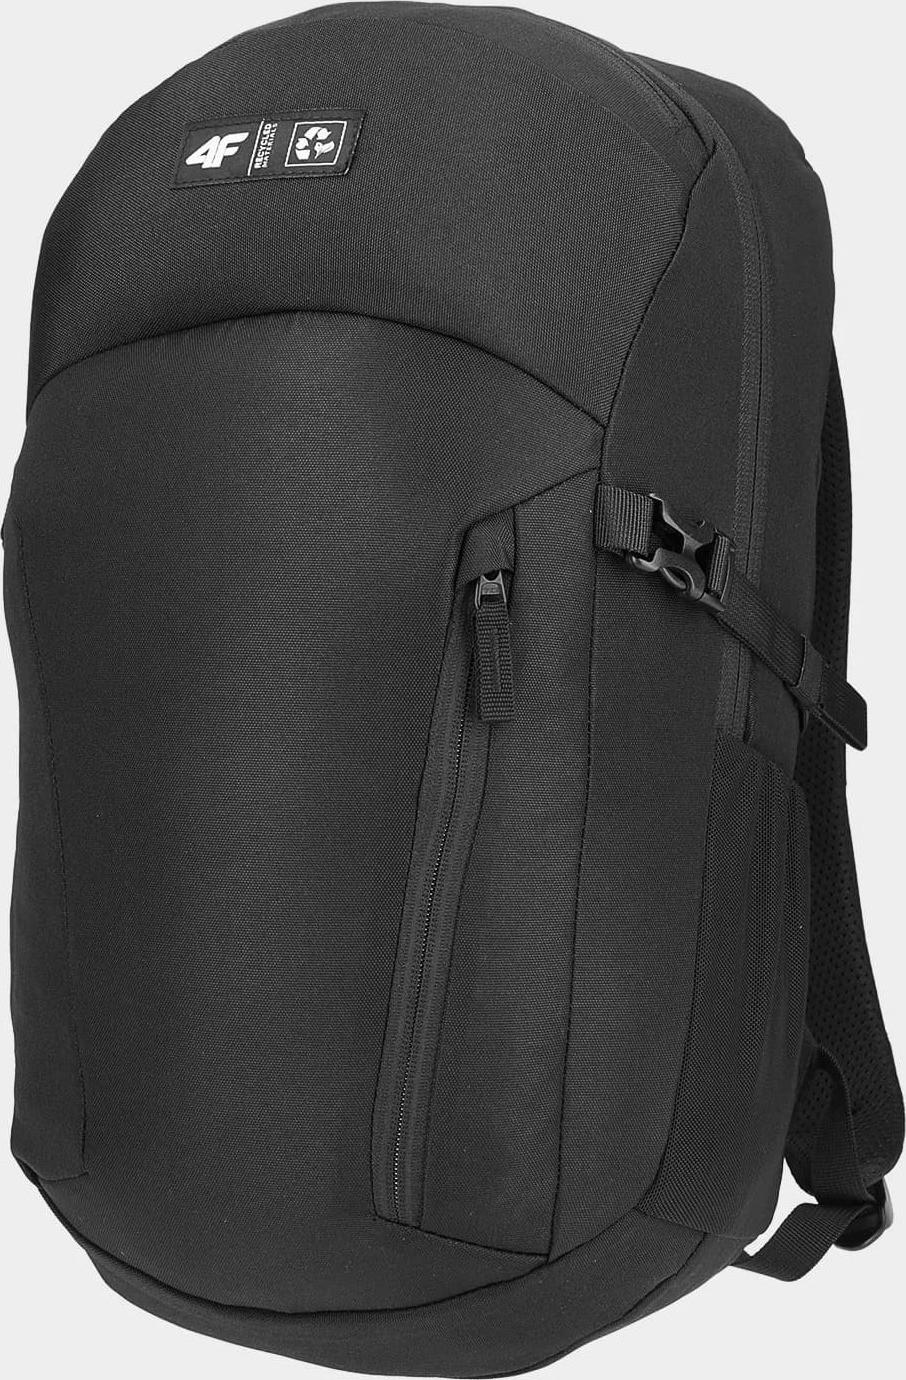 Mestský ruksak 4F PCU207 Čierny černá 17L